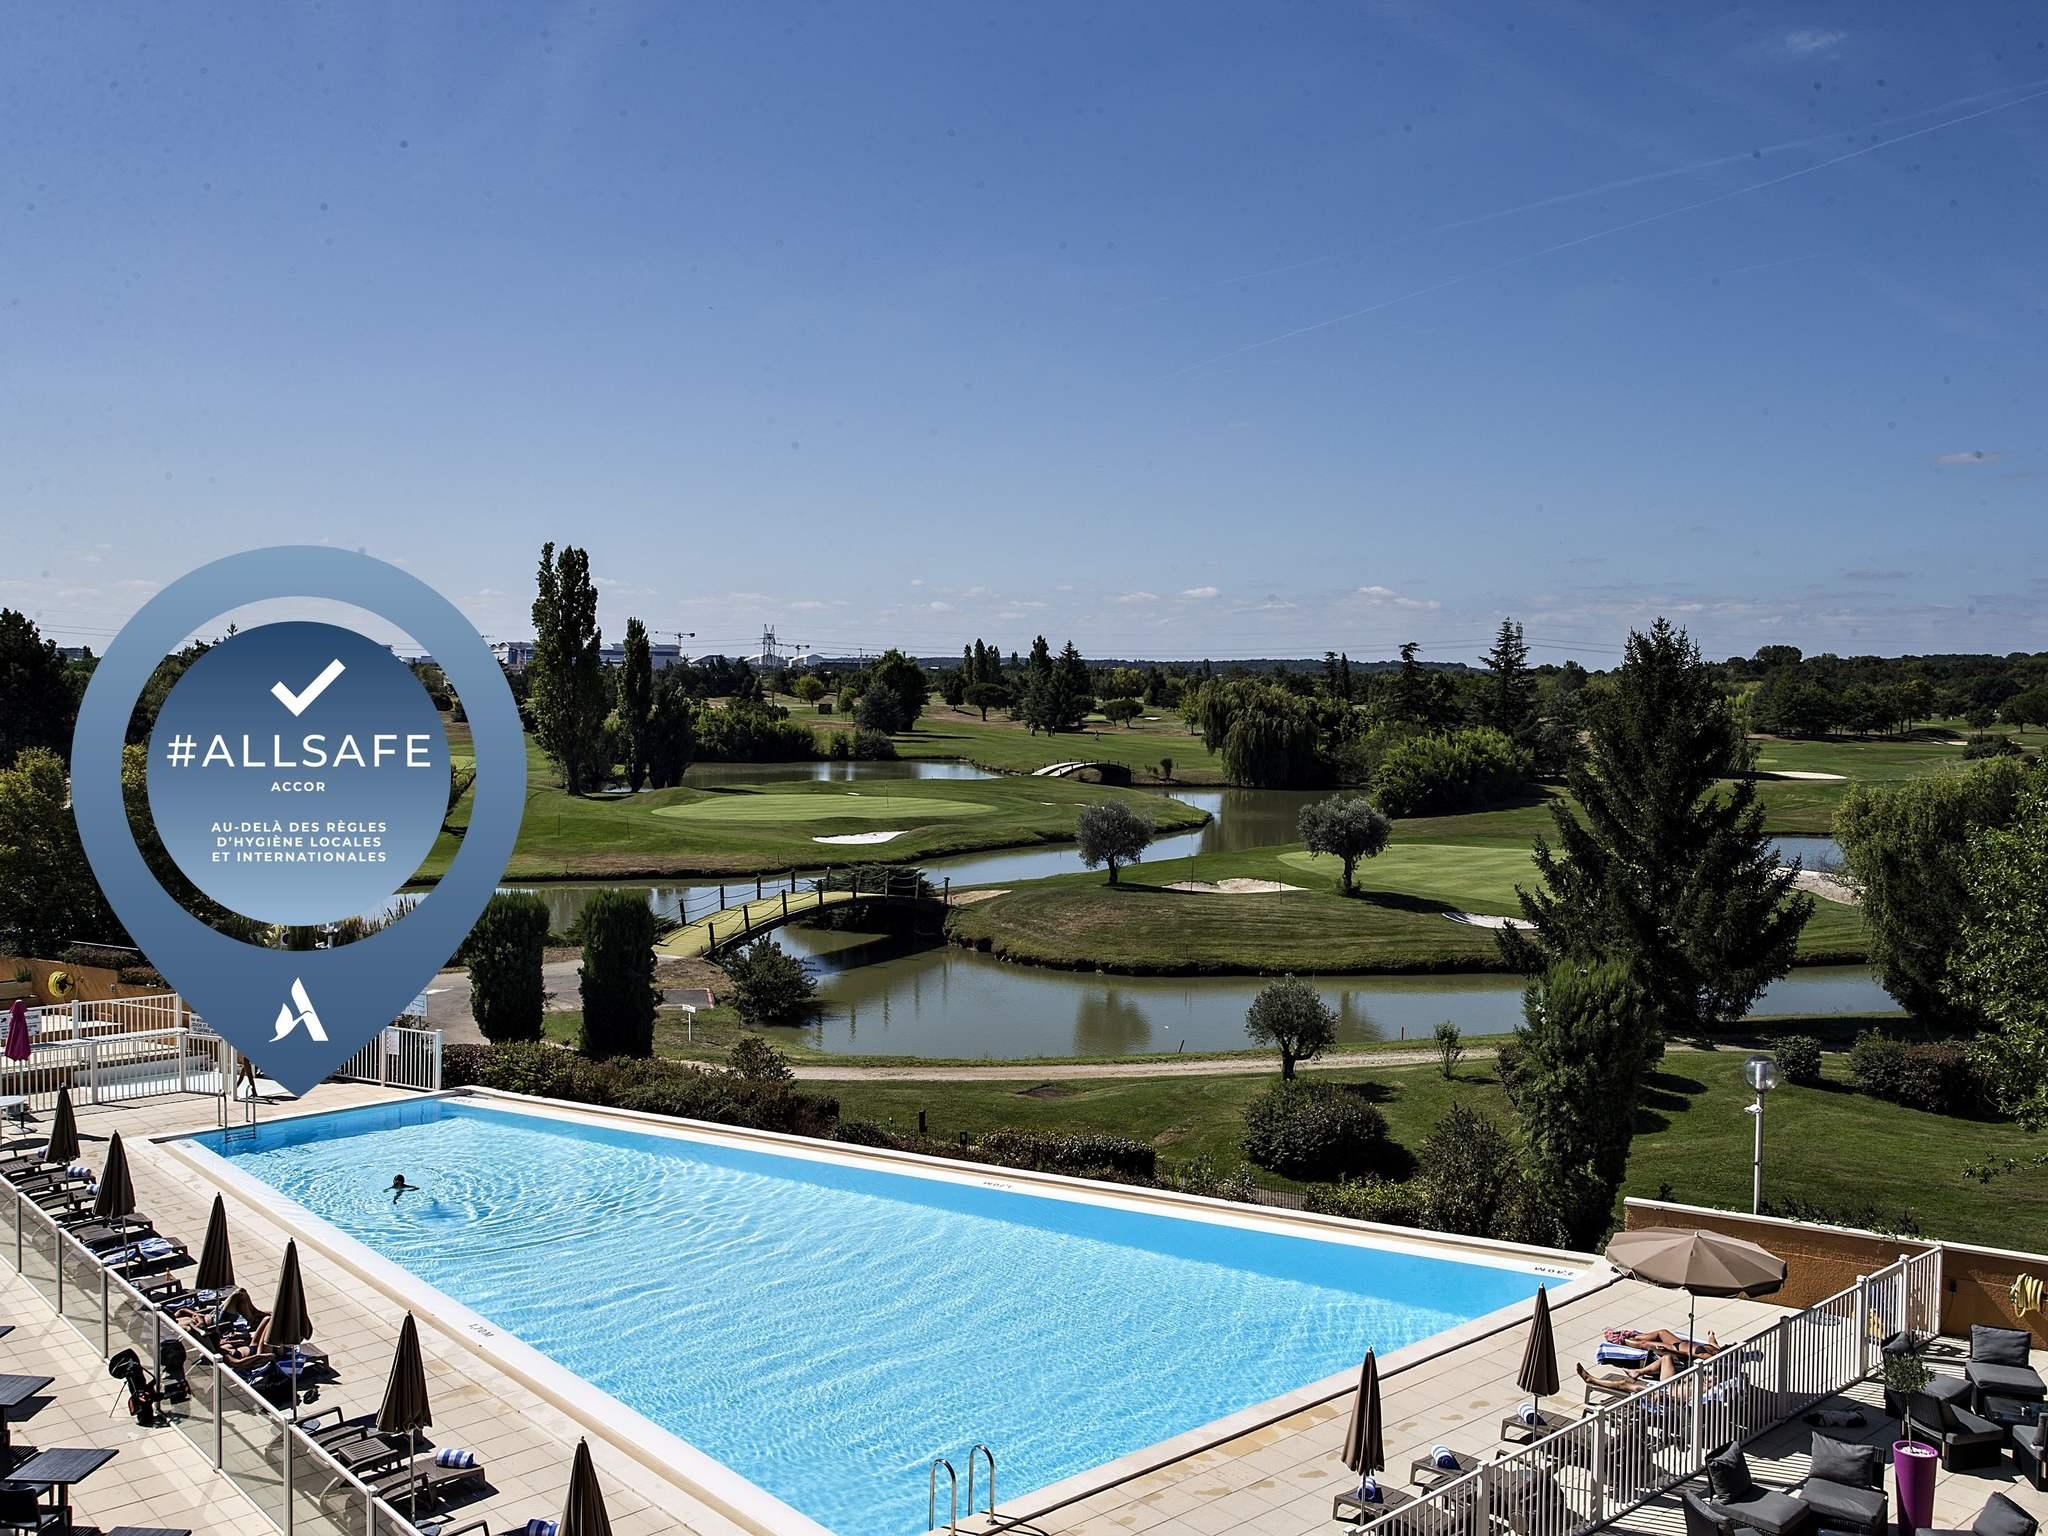 Hotel in SEILH - Mercure Toulouse Airport Golf de Seilh Hotel